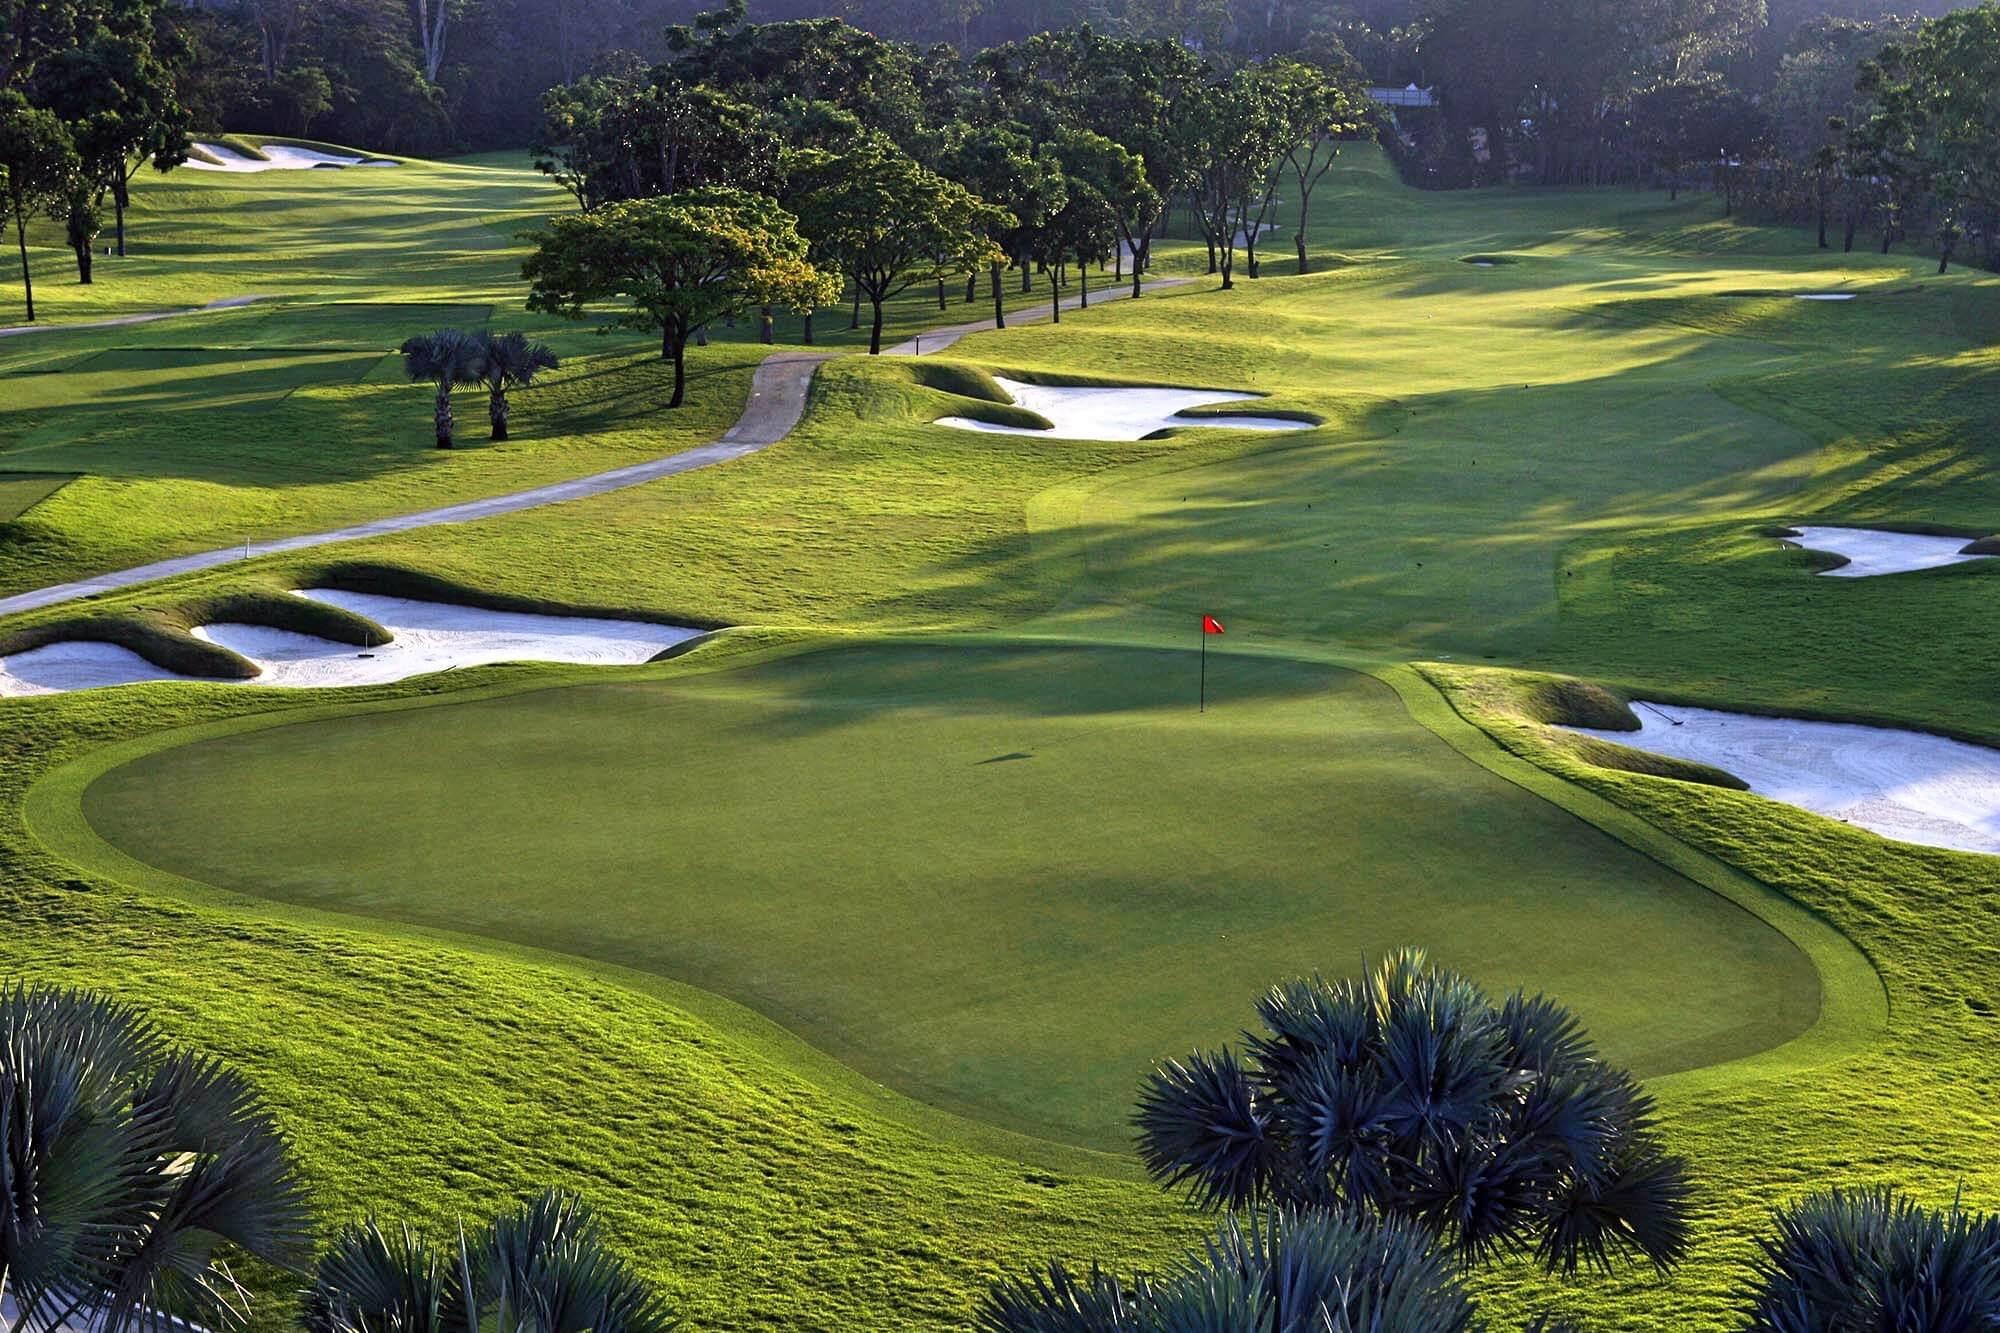 golfplatz singapur